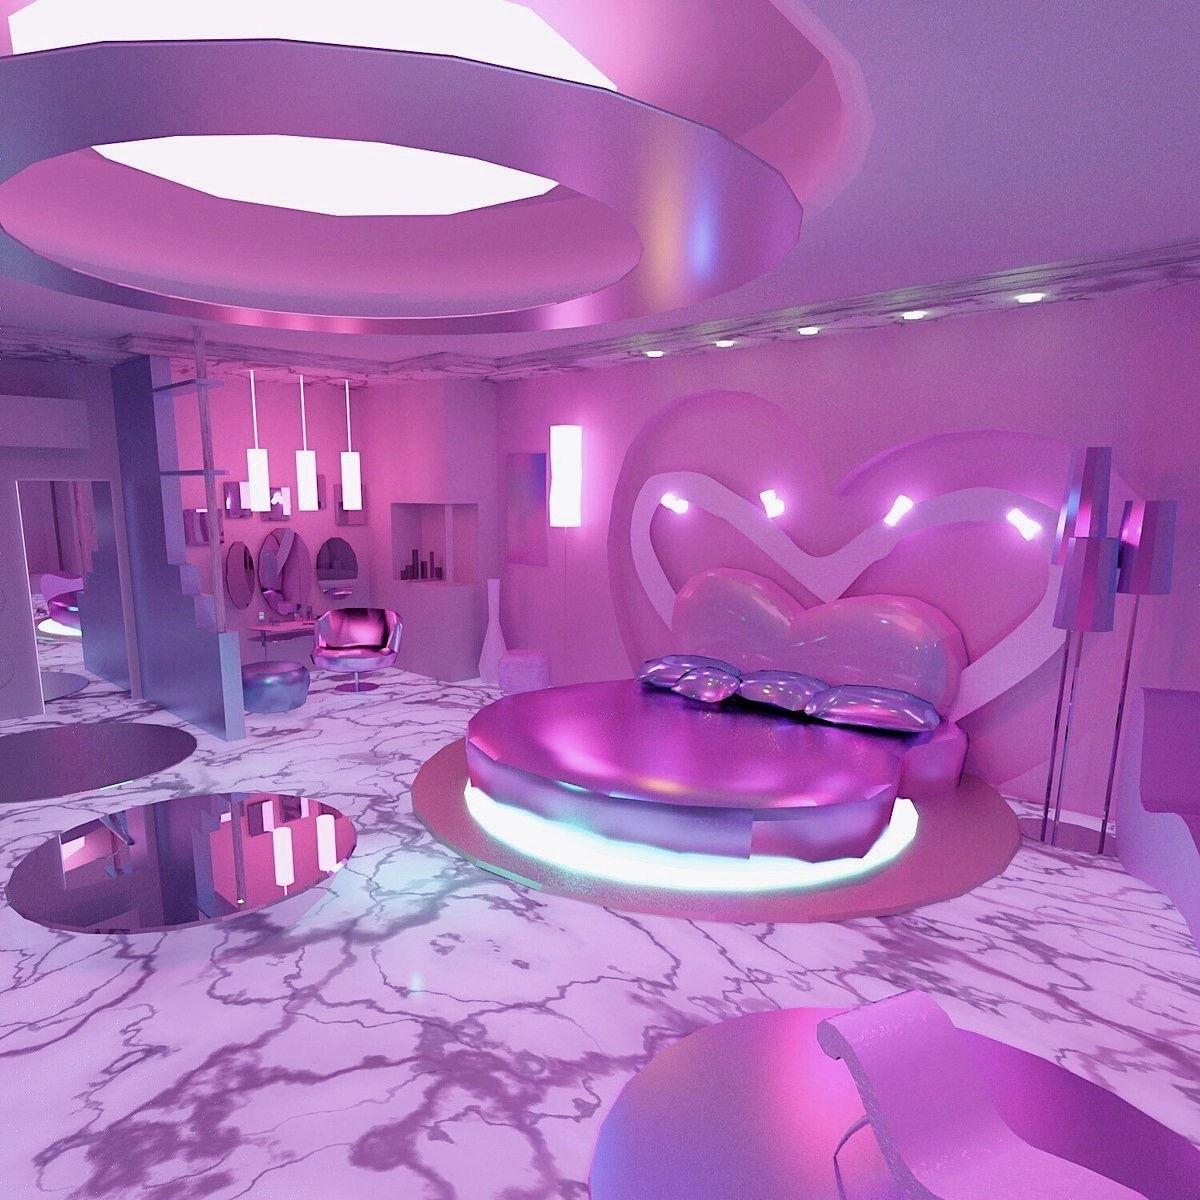 Vaporwave Room Tumblr Ow94orthz01vx9hc8o7 1280 Jpg 1200 1200 Neon Bedroom Girl Bedroom Designs Neon Room